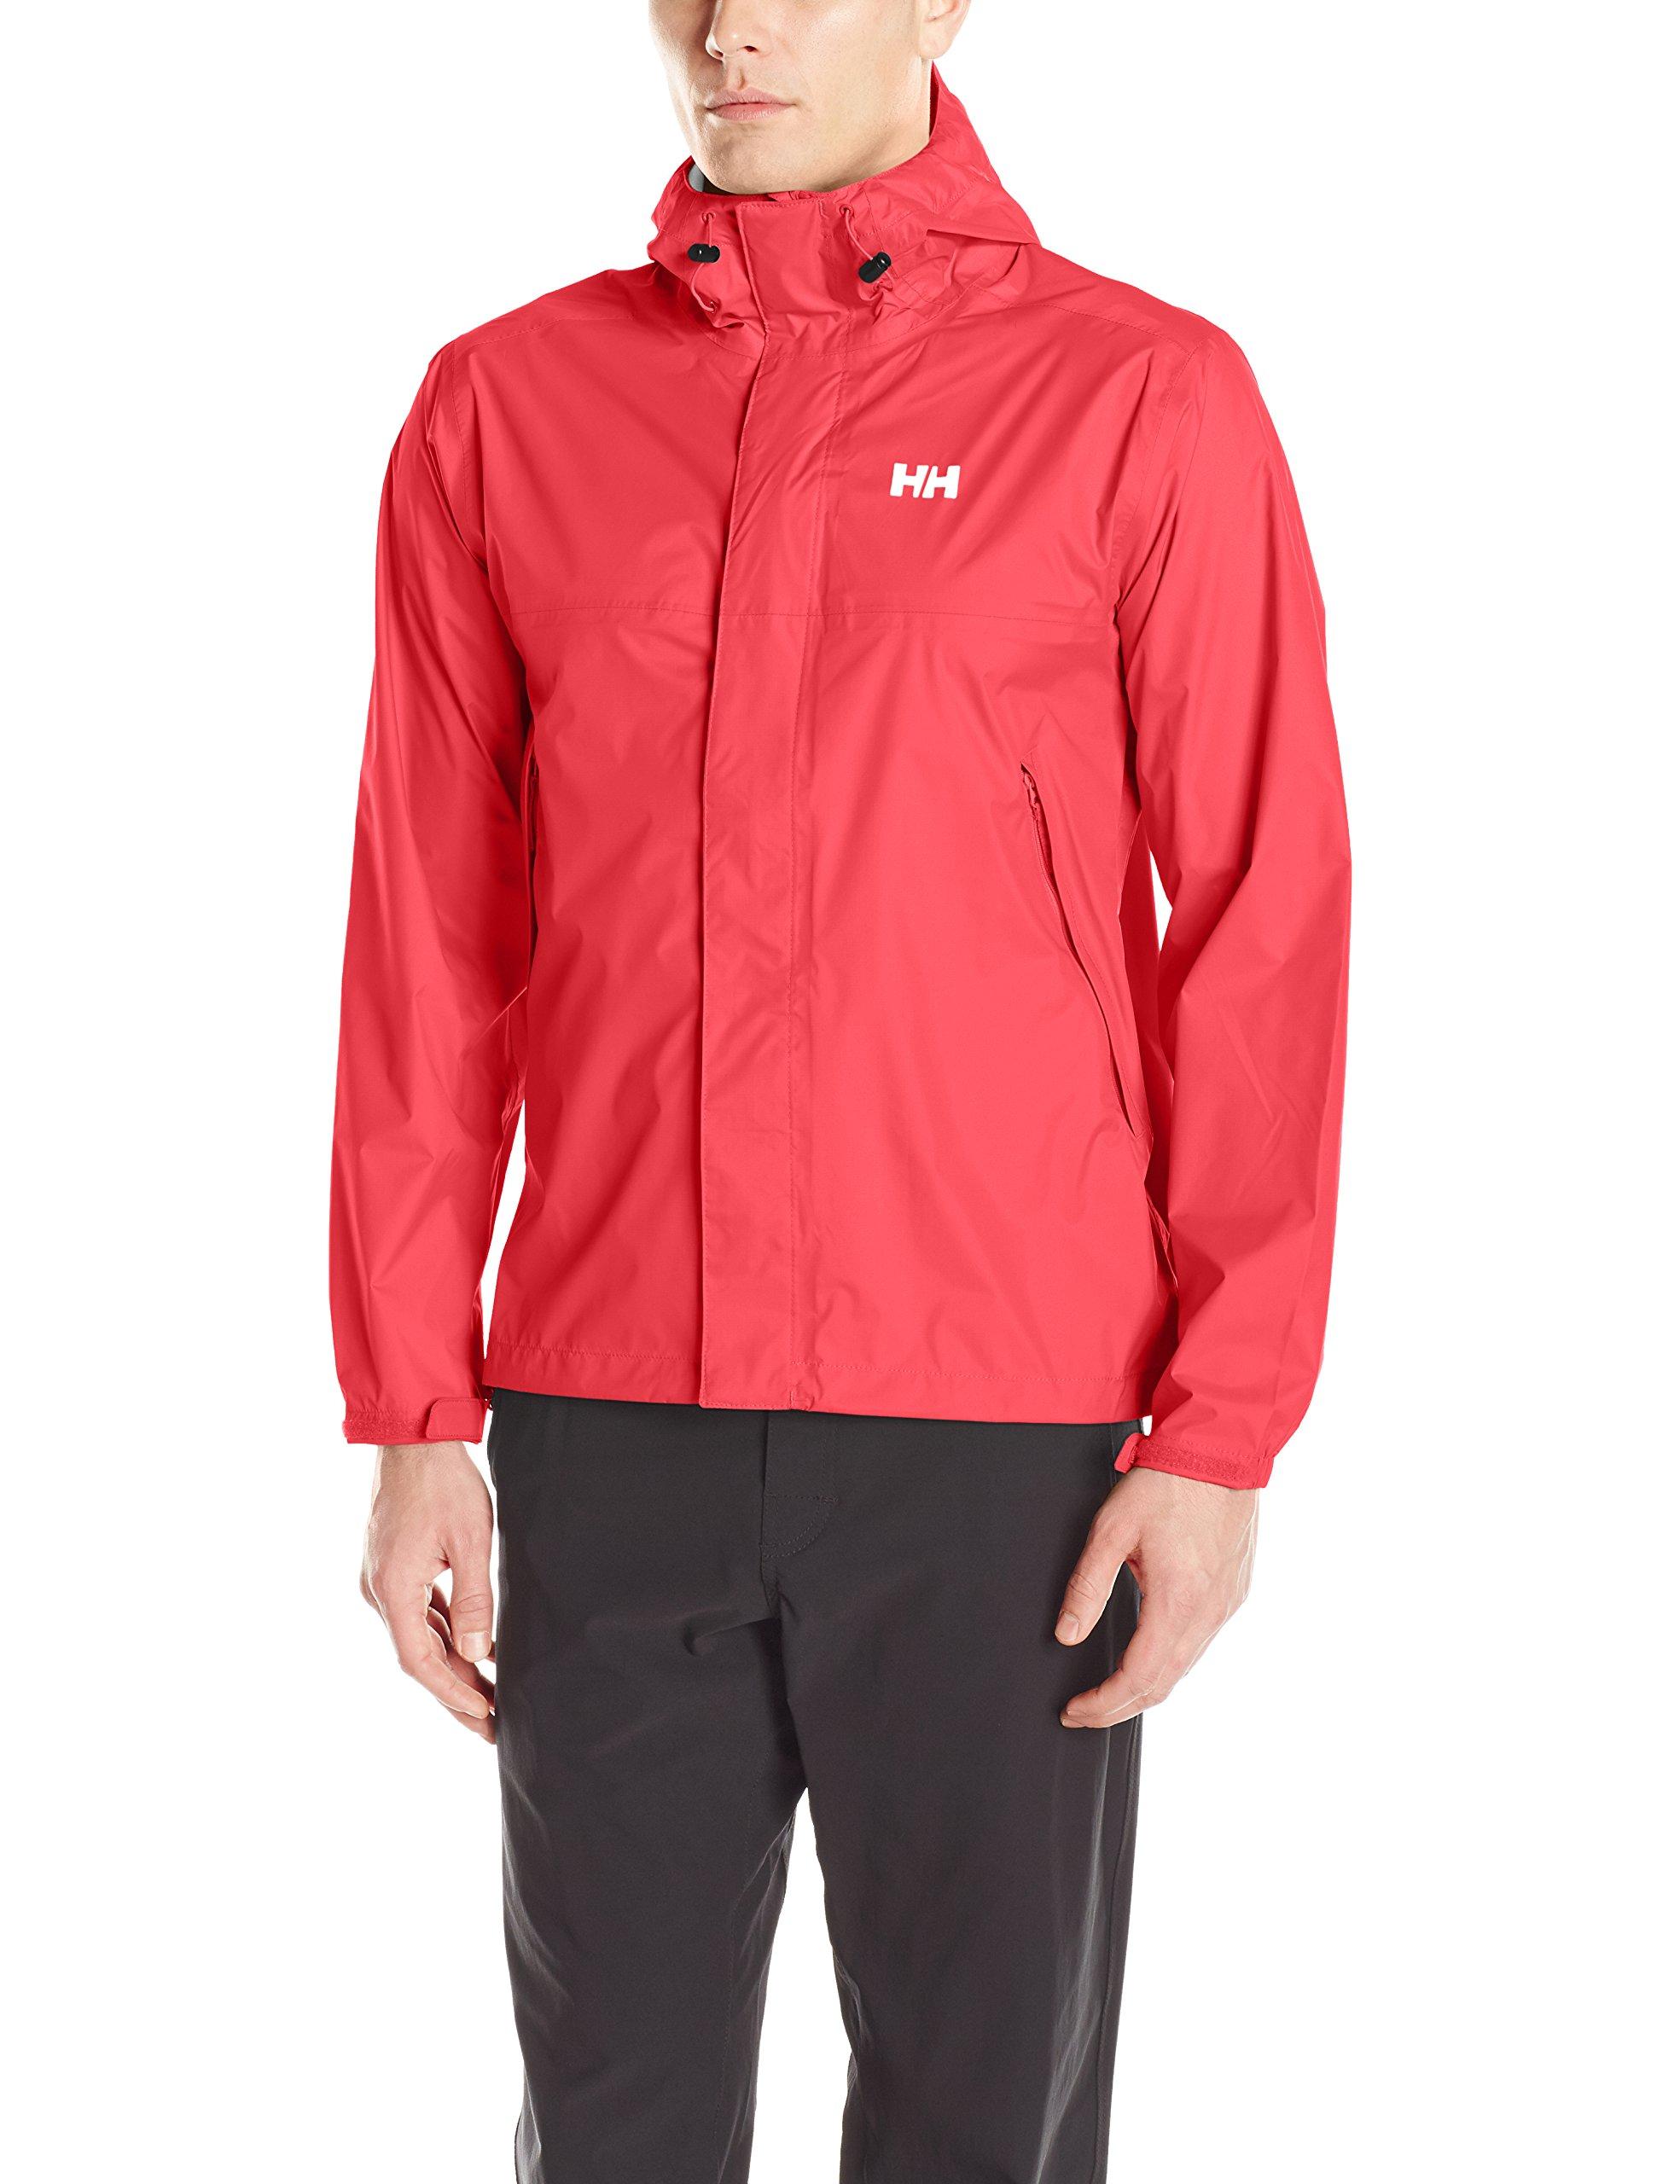 Helly Hansen Men's Loke Waterproof Windproof Breathable Adventure Rain Jacket, 162 Red, Medium